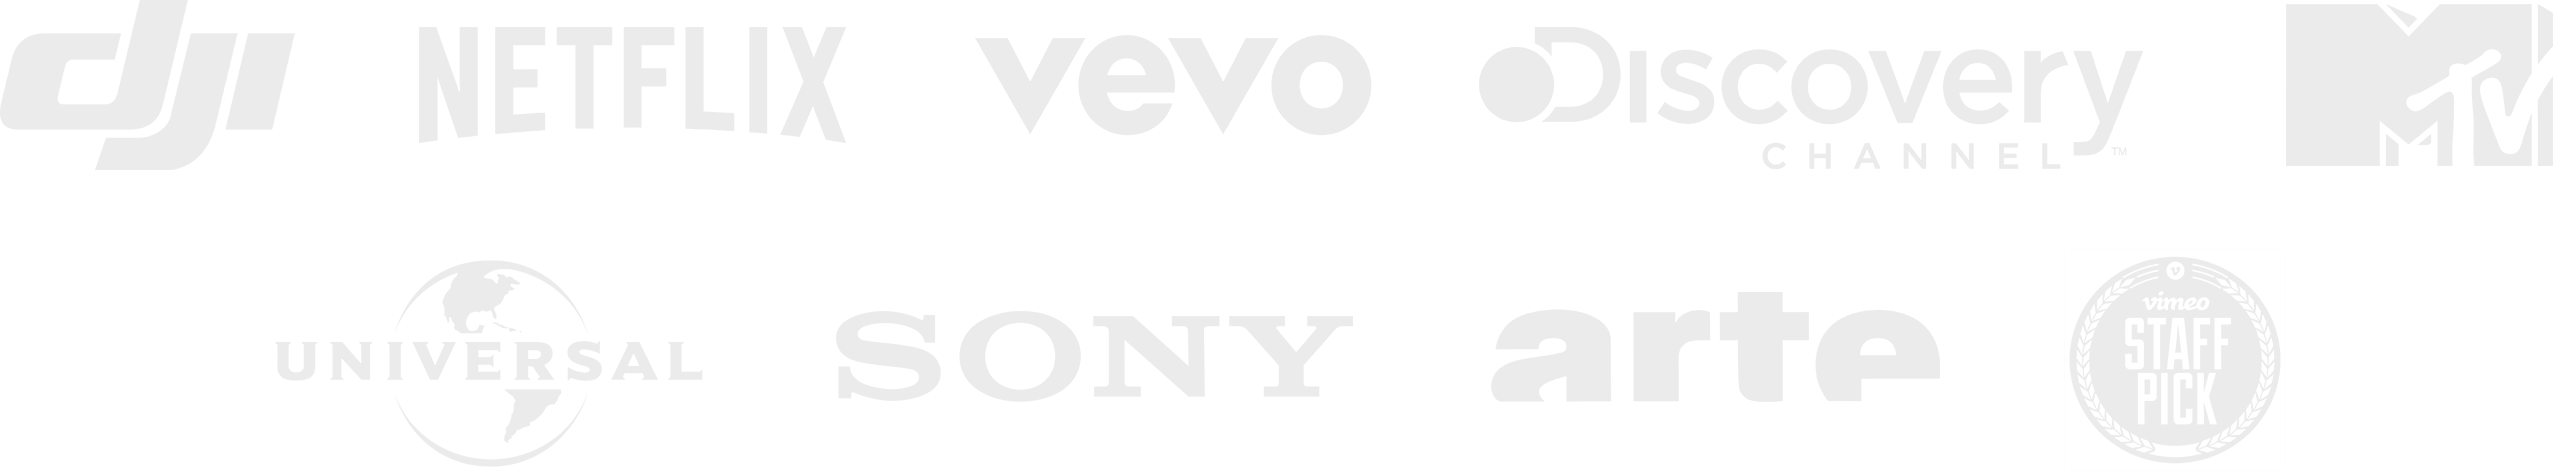 VisionColor - References